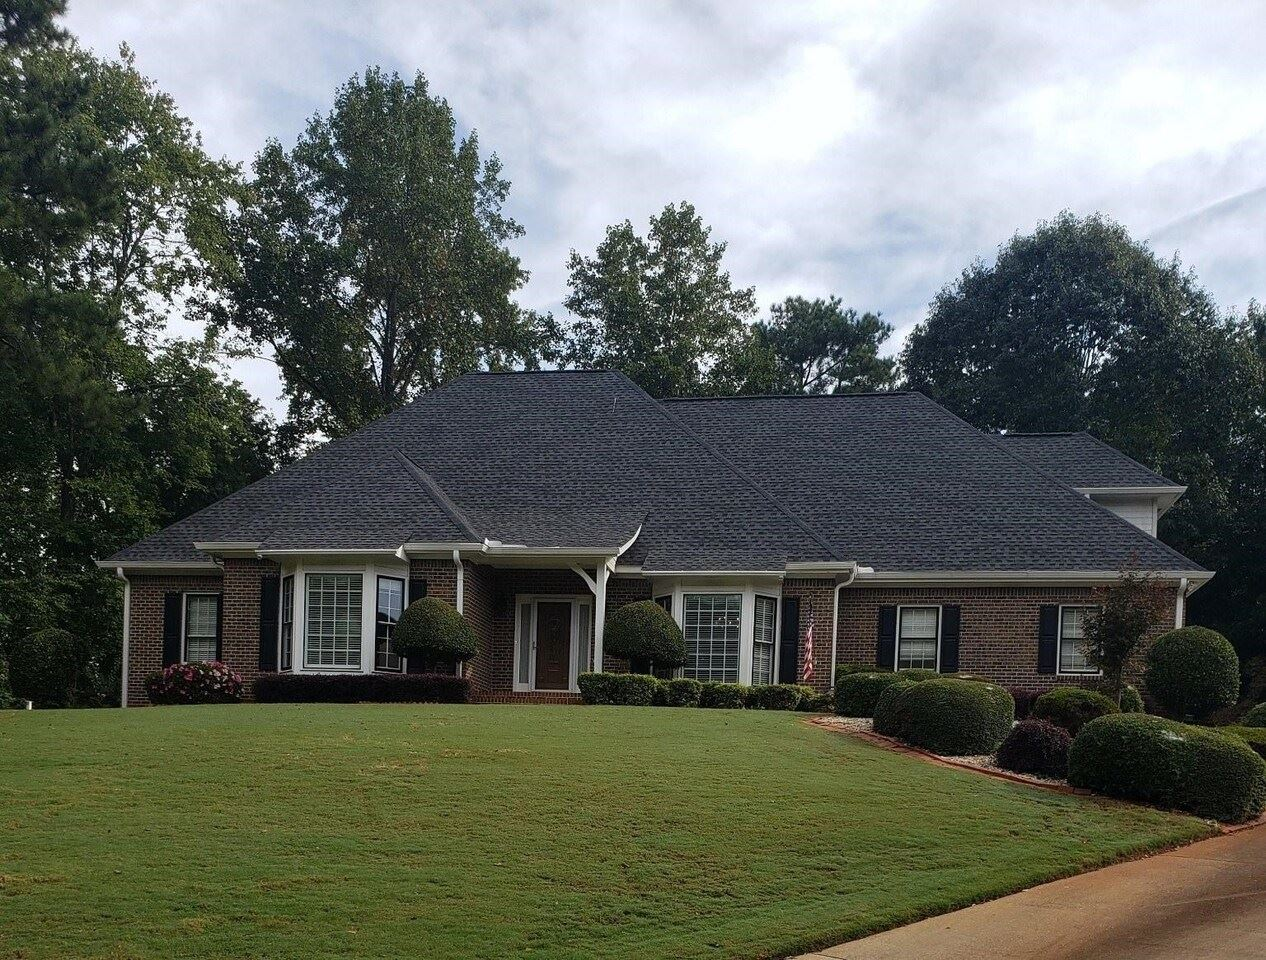 775 Ferncroft, Roswell, GA 30075 - MLS#: 9059883